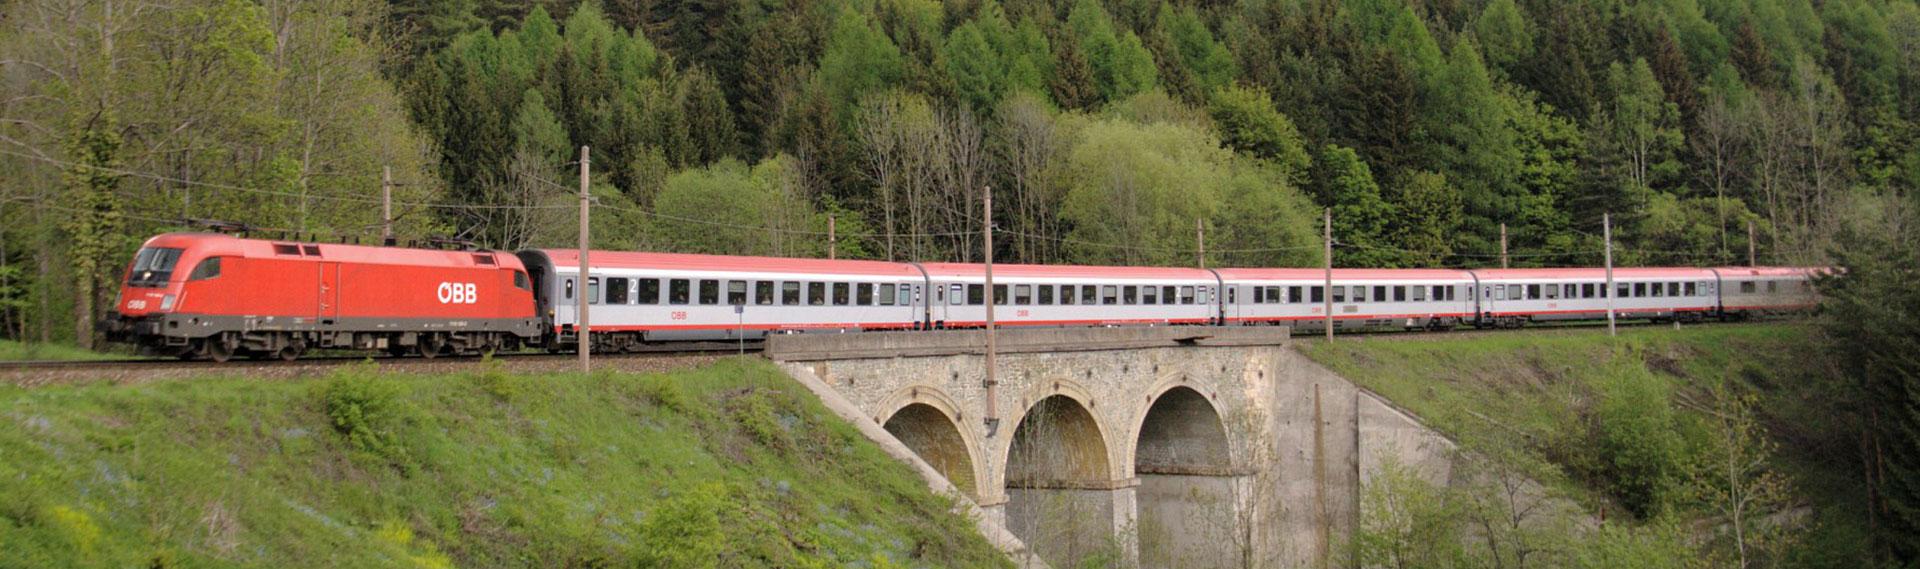 Austria-OBB-Intercity